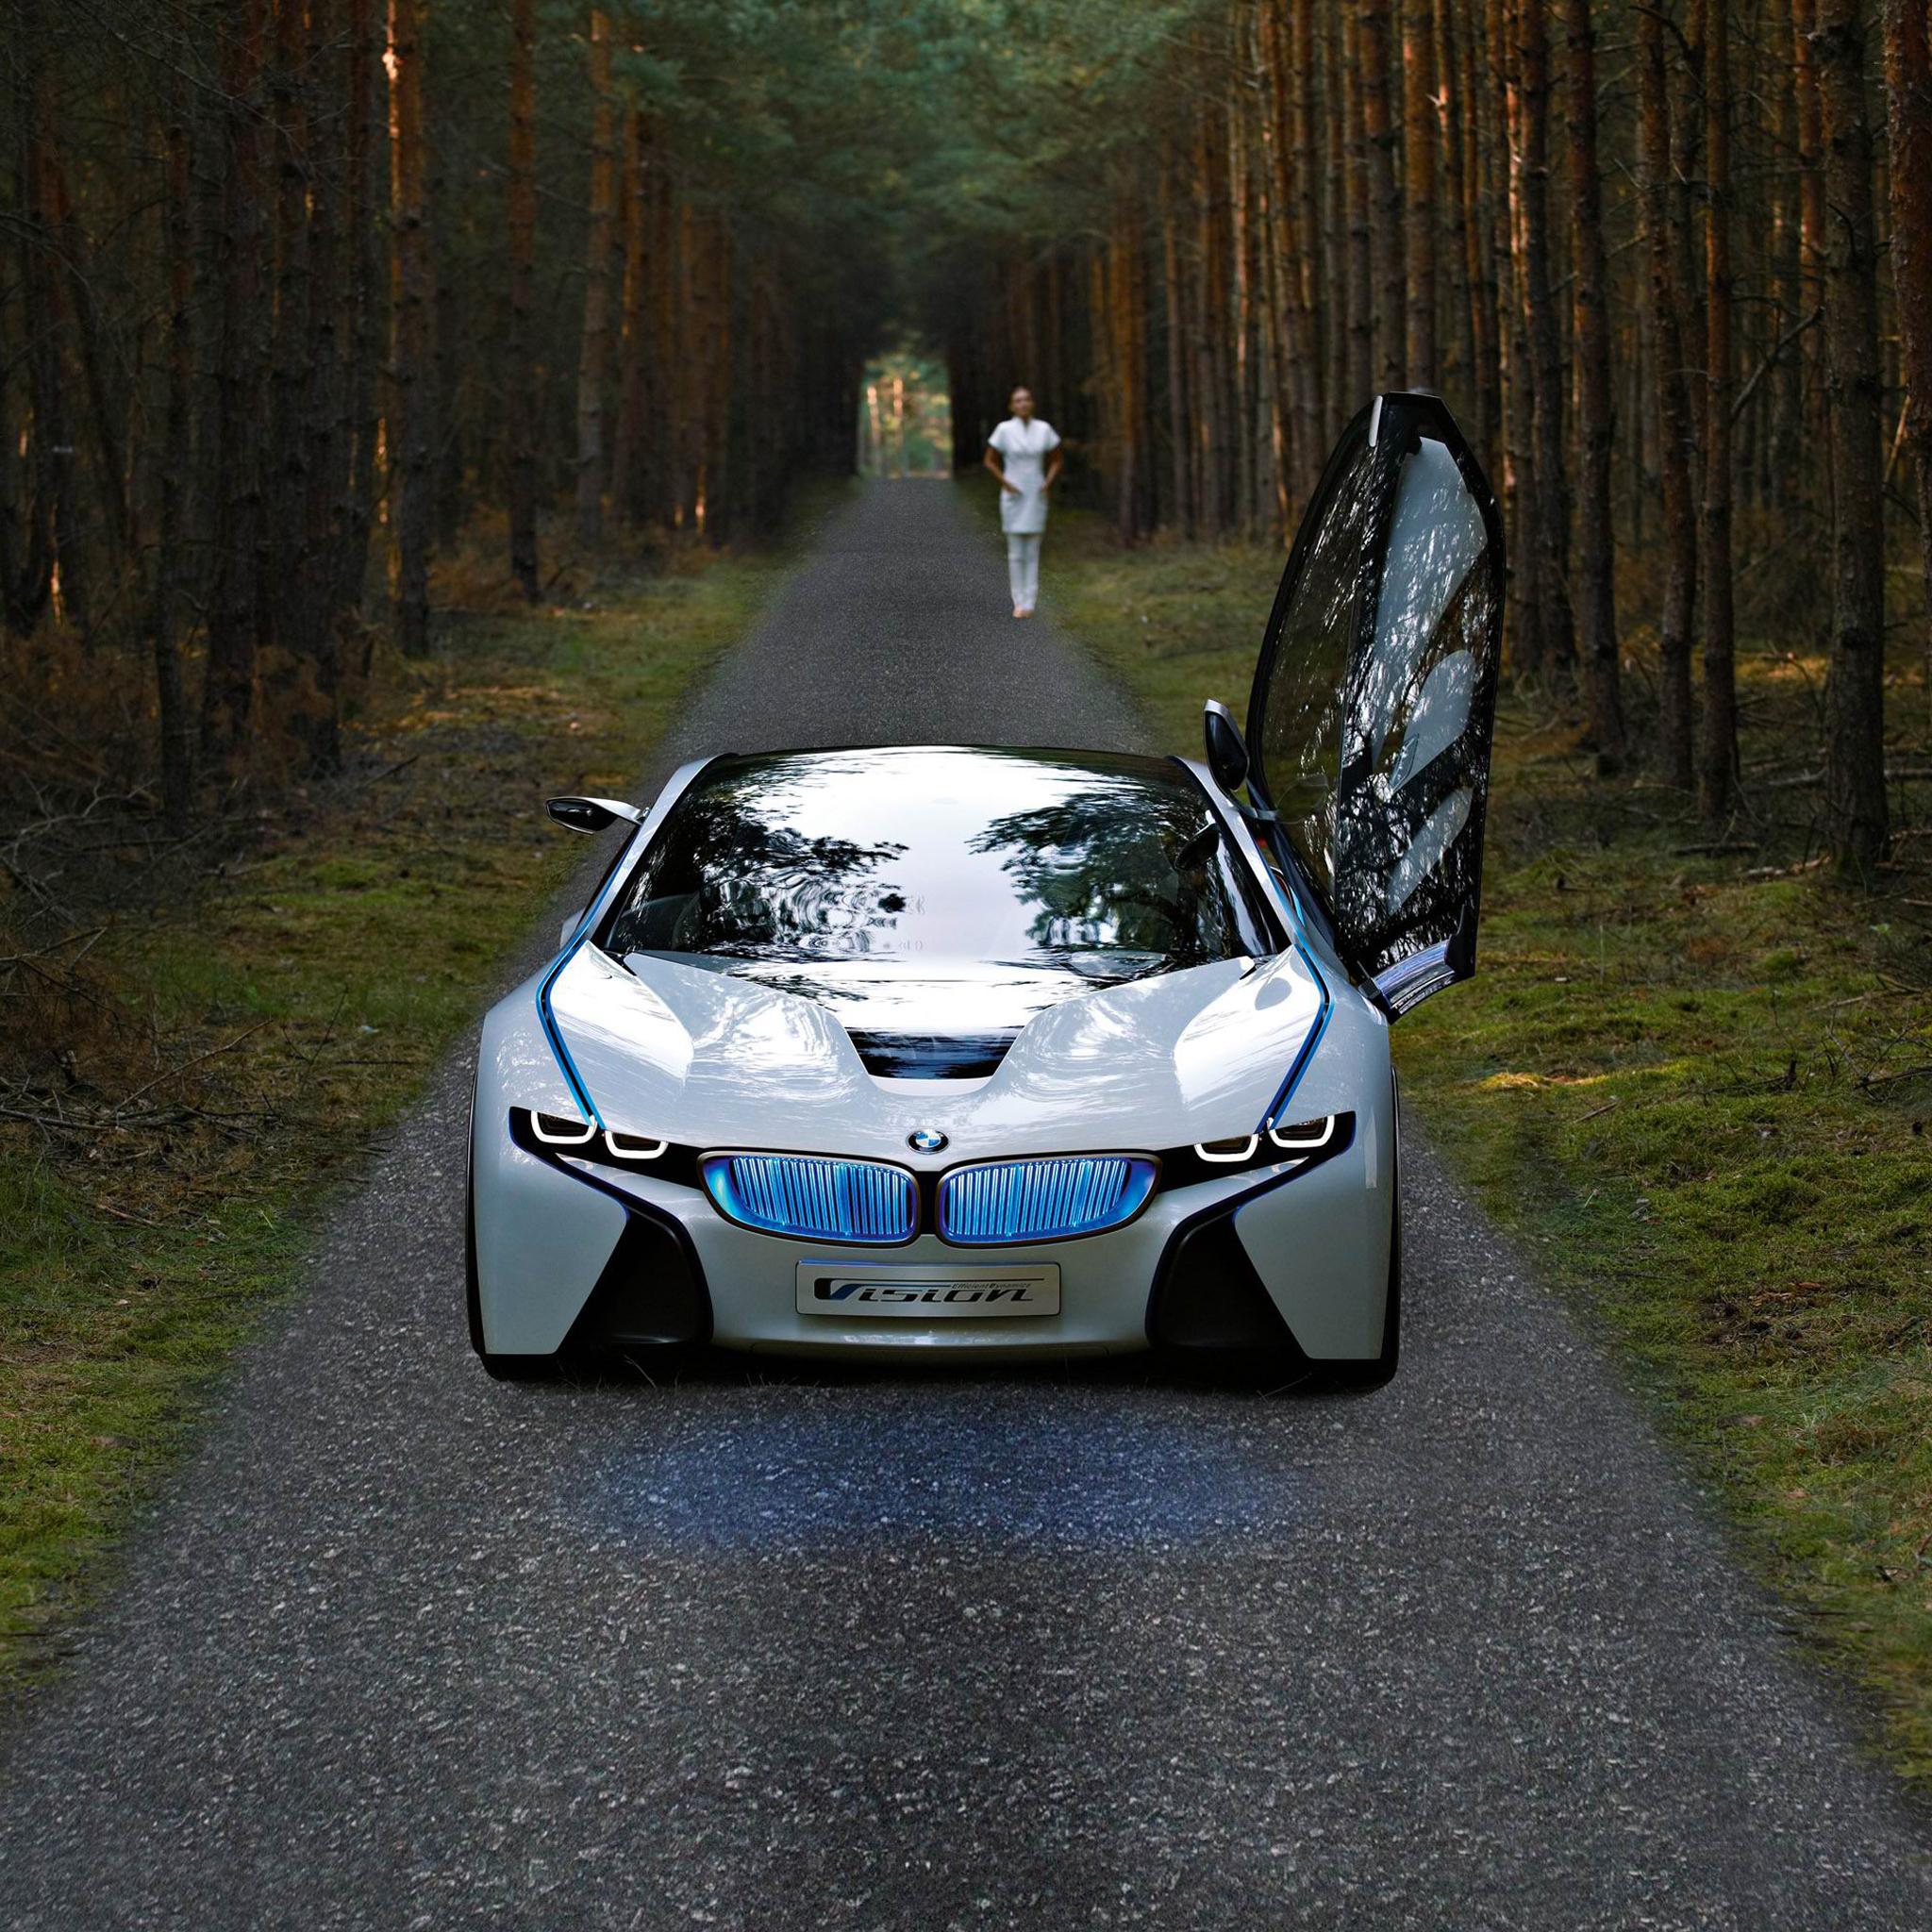 BMW-Vision-Efficient-3Wallpapers-iPad-Retina